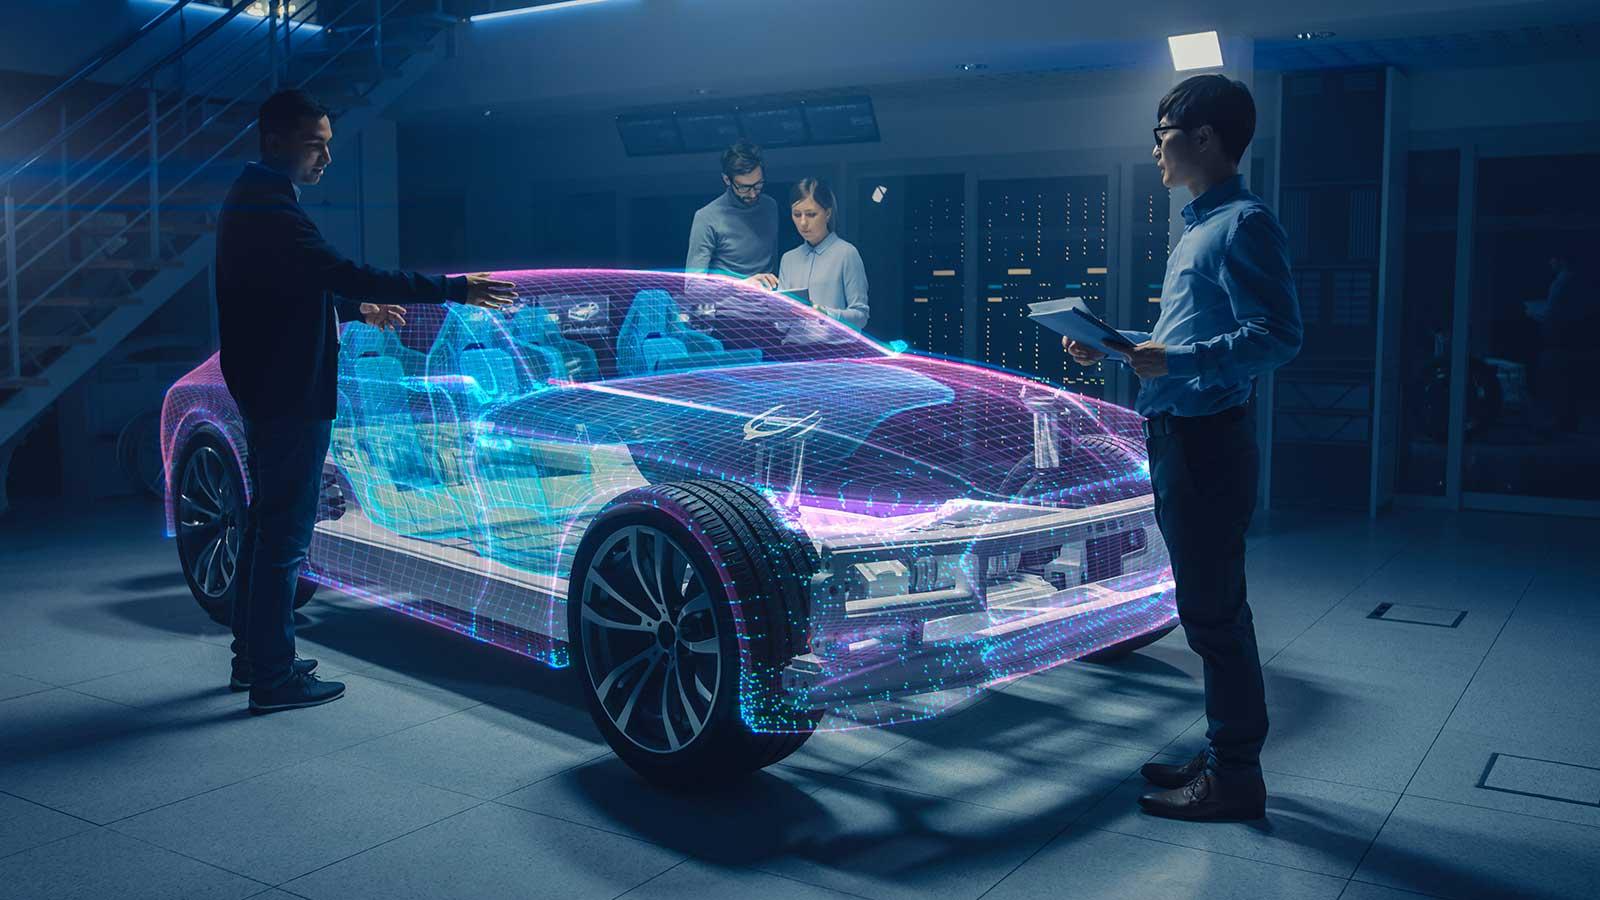 spatial-computing-3d-virtual-car-2